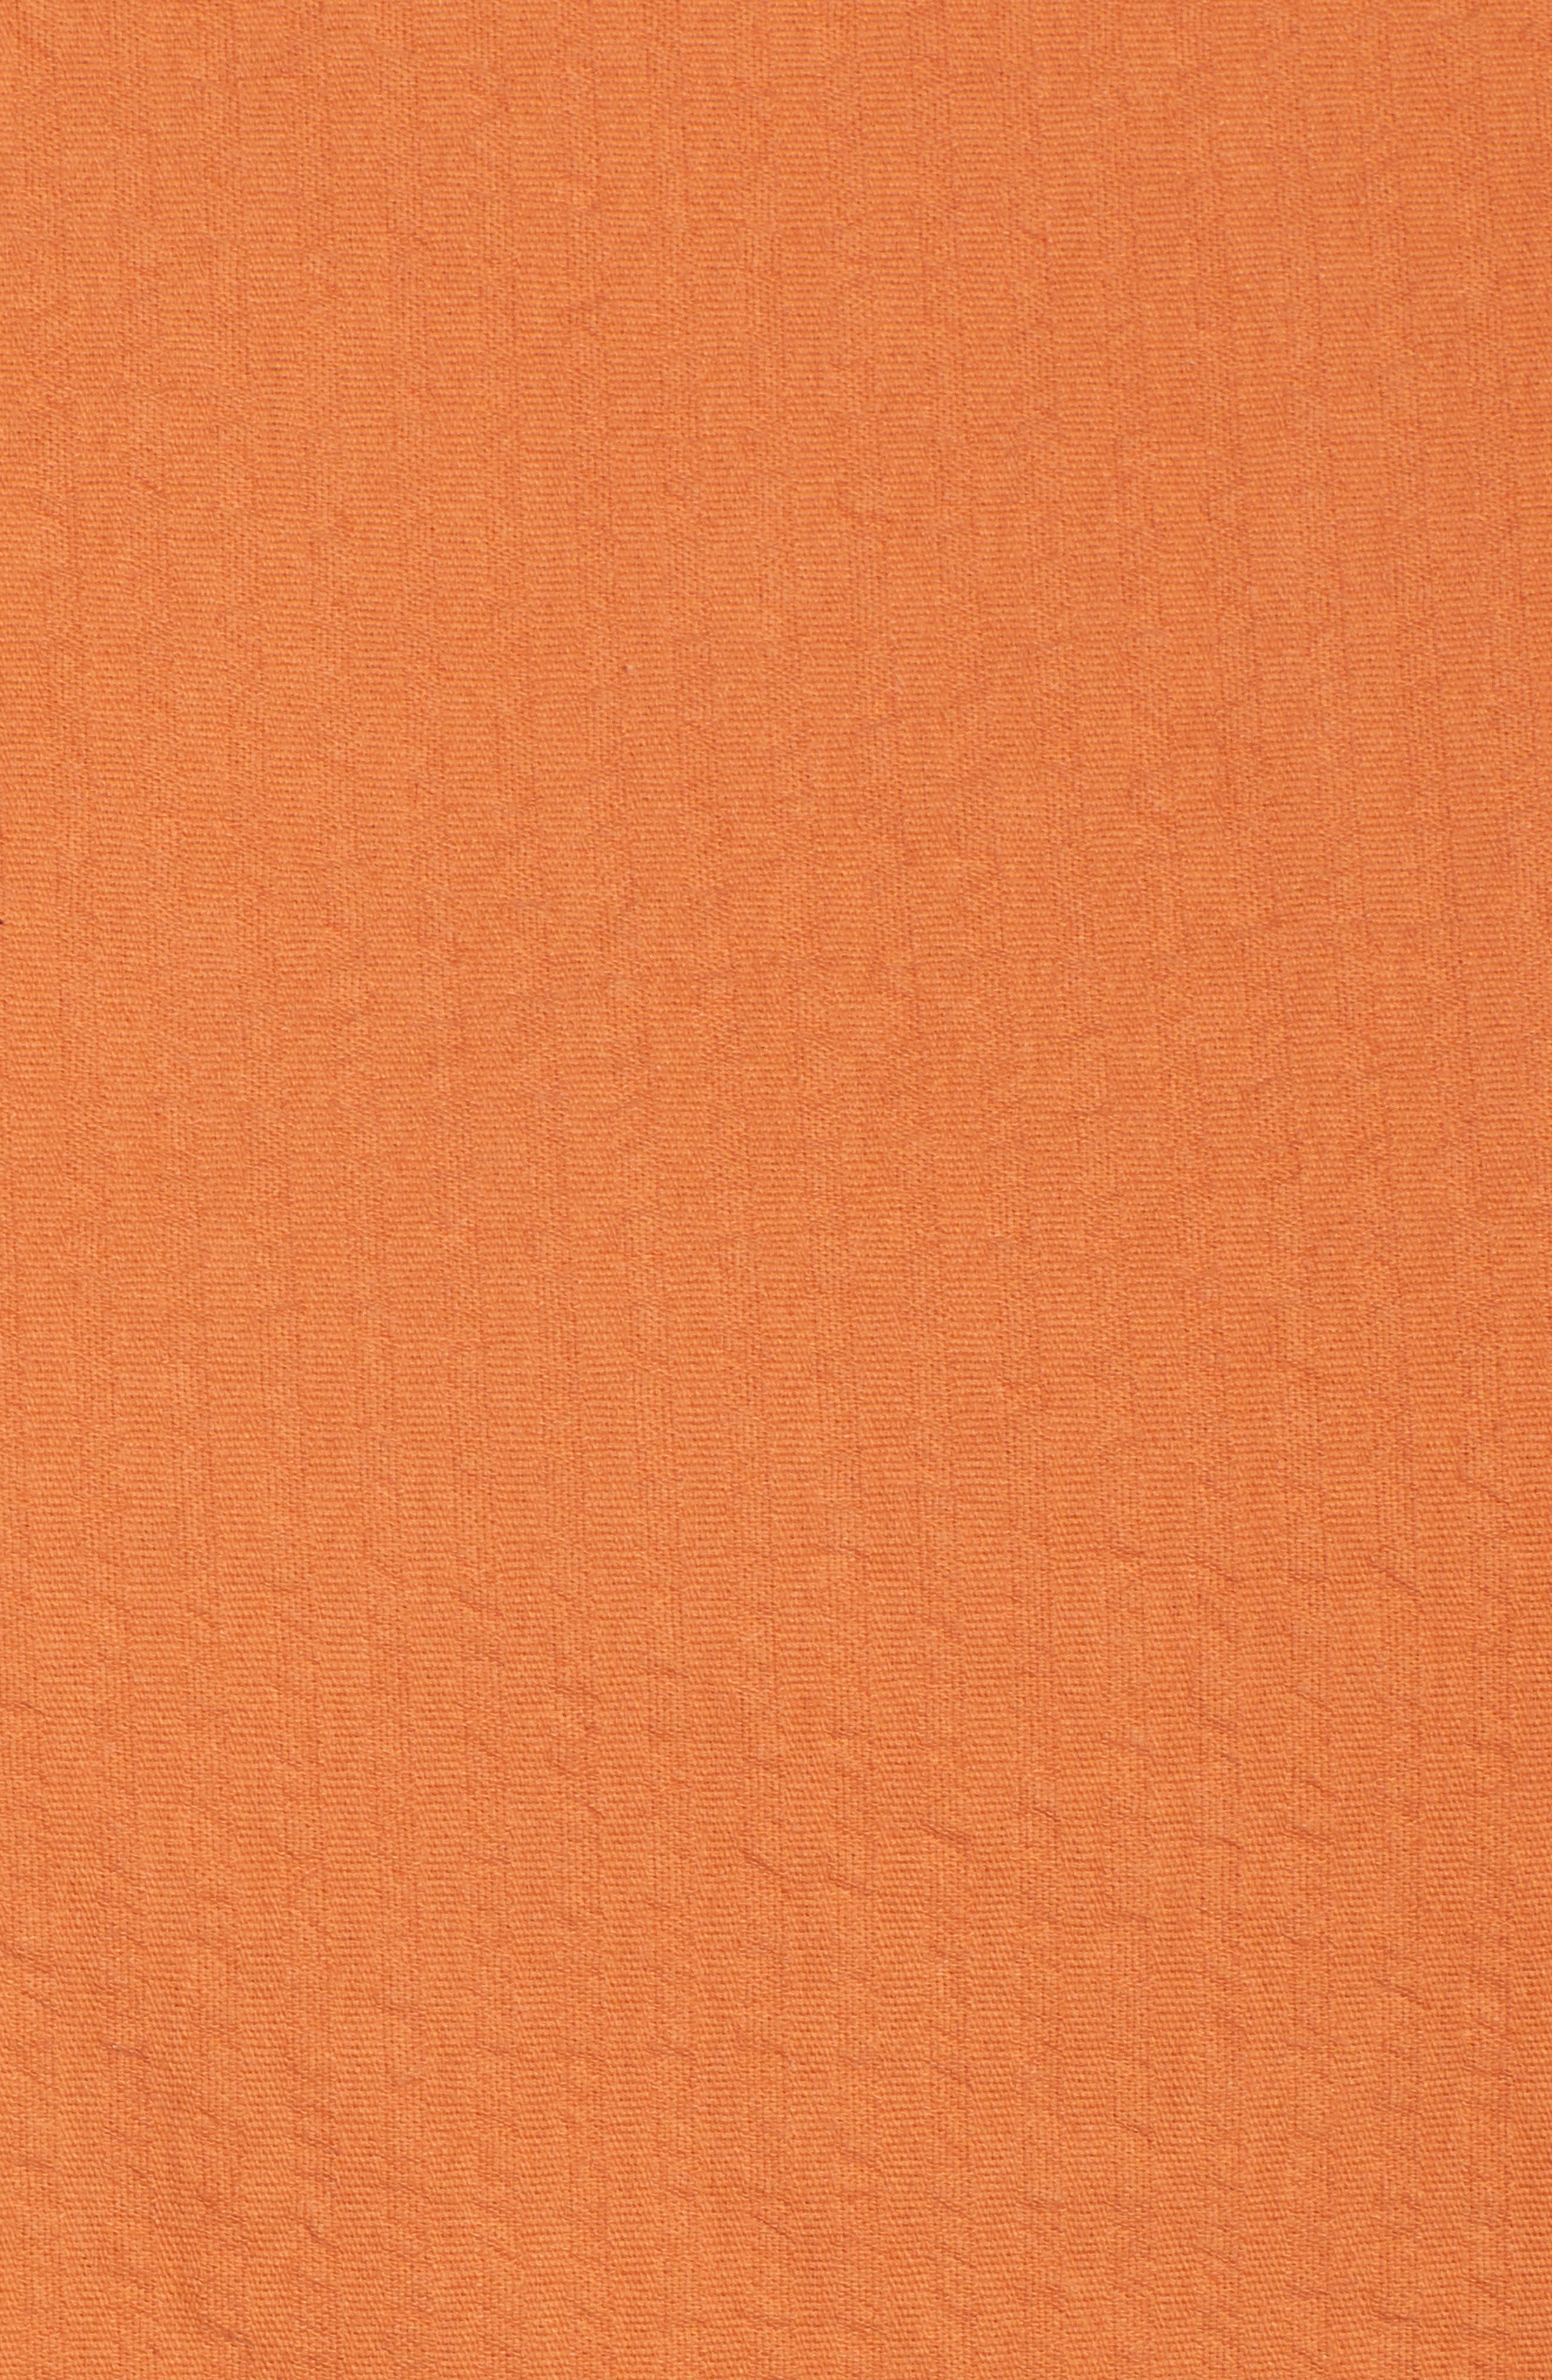 Seersucker Ruffle Top,                             Alternate thumbnail 6, color,                             235